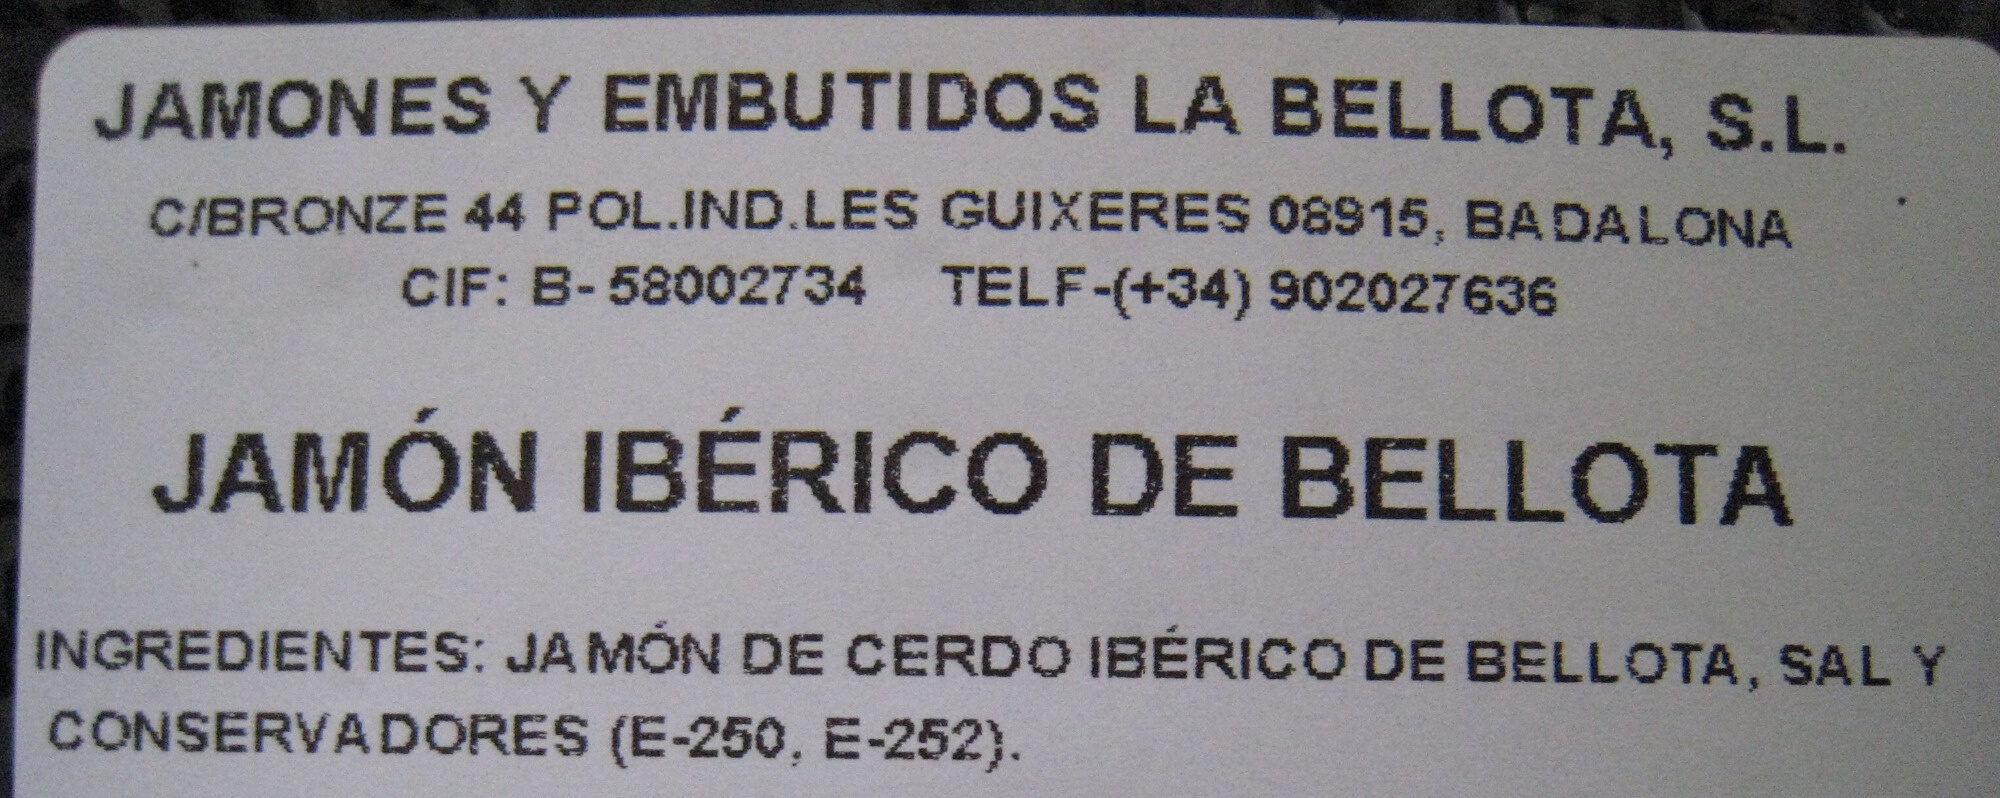 Jamón Ibérico 100 g de Bellota - Ingrédients - es